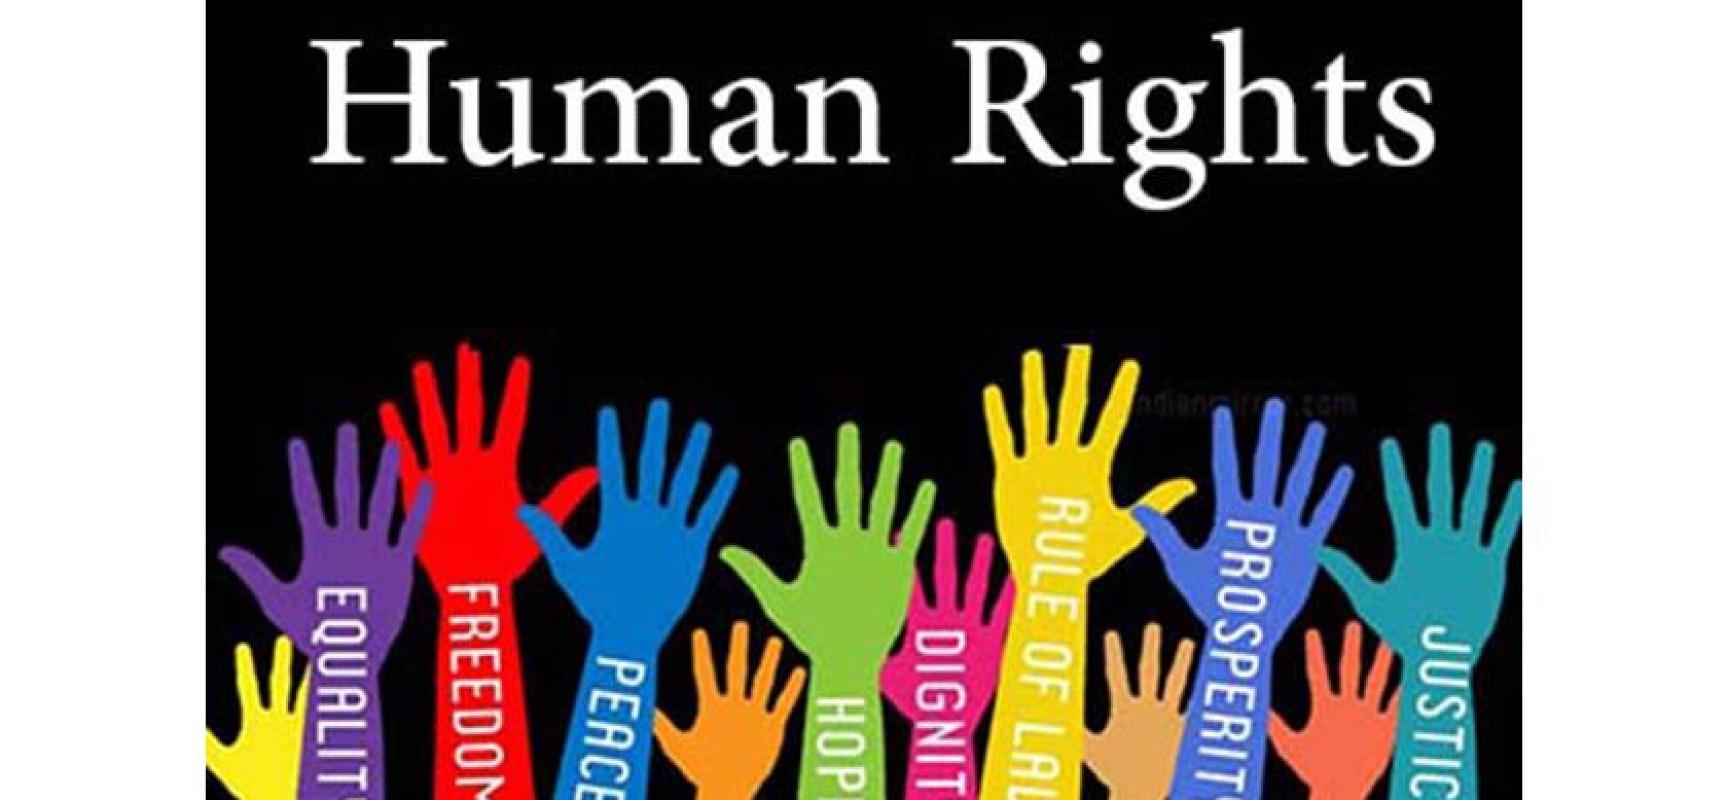 human_rights-1728x800_c.jpg